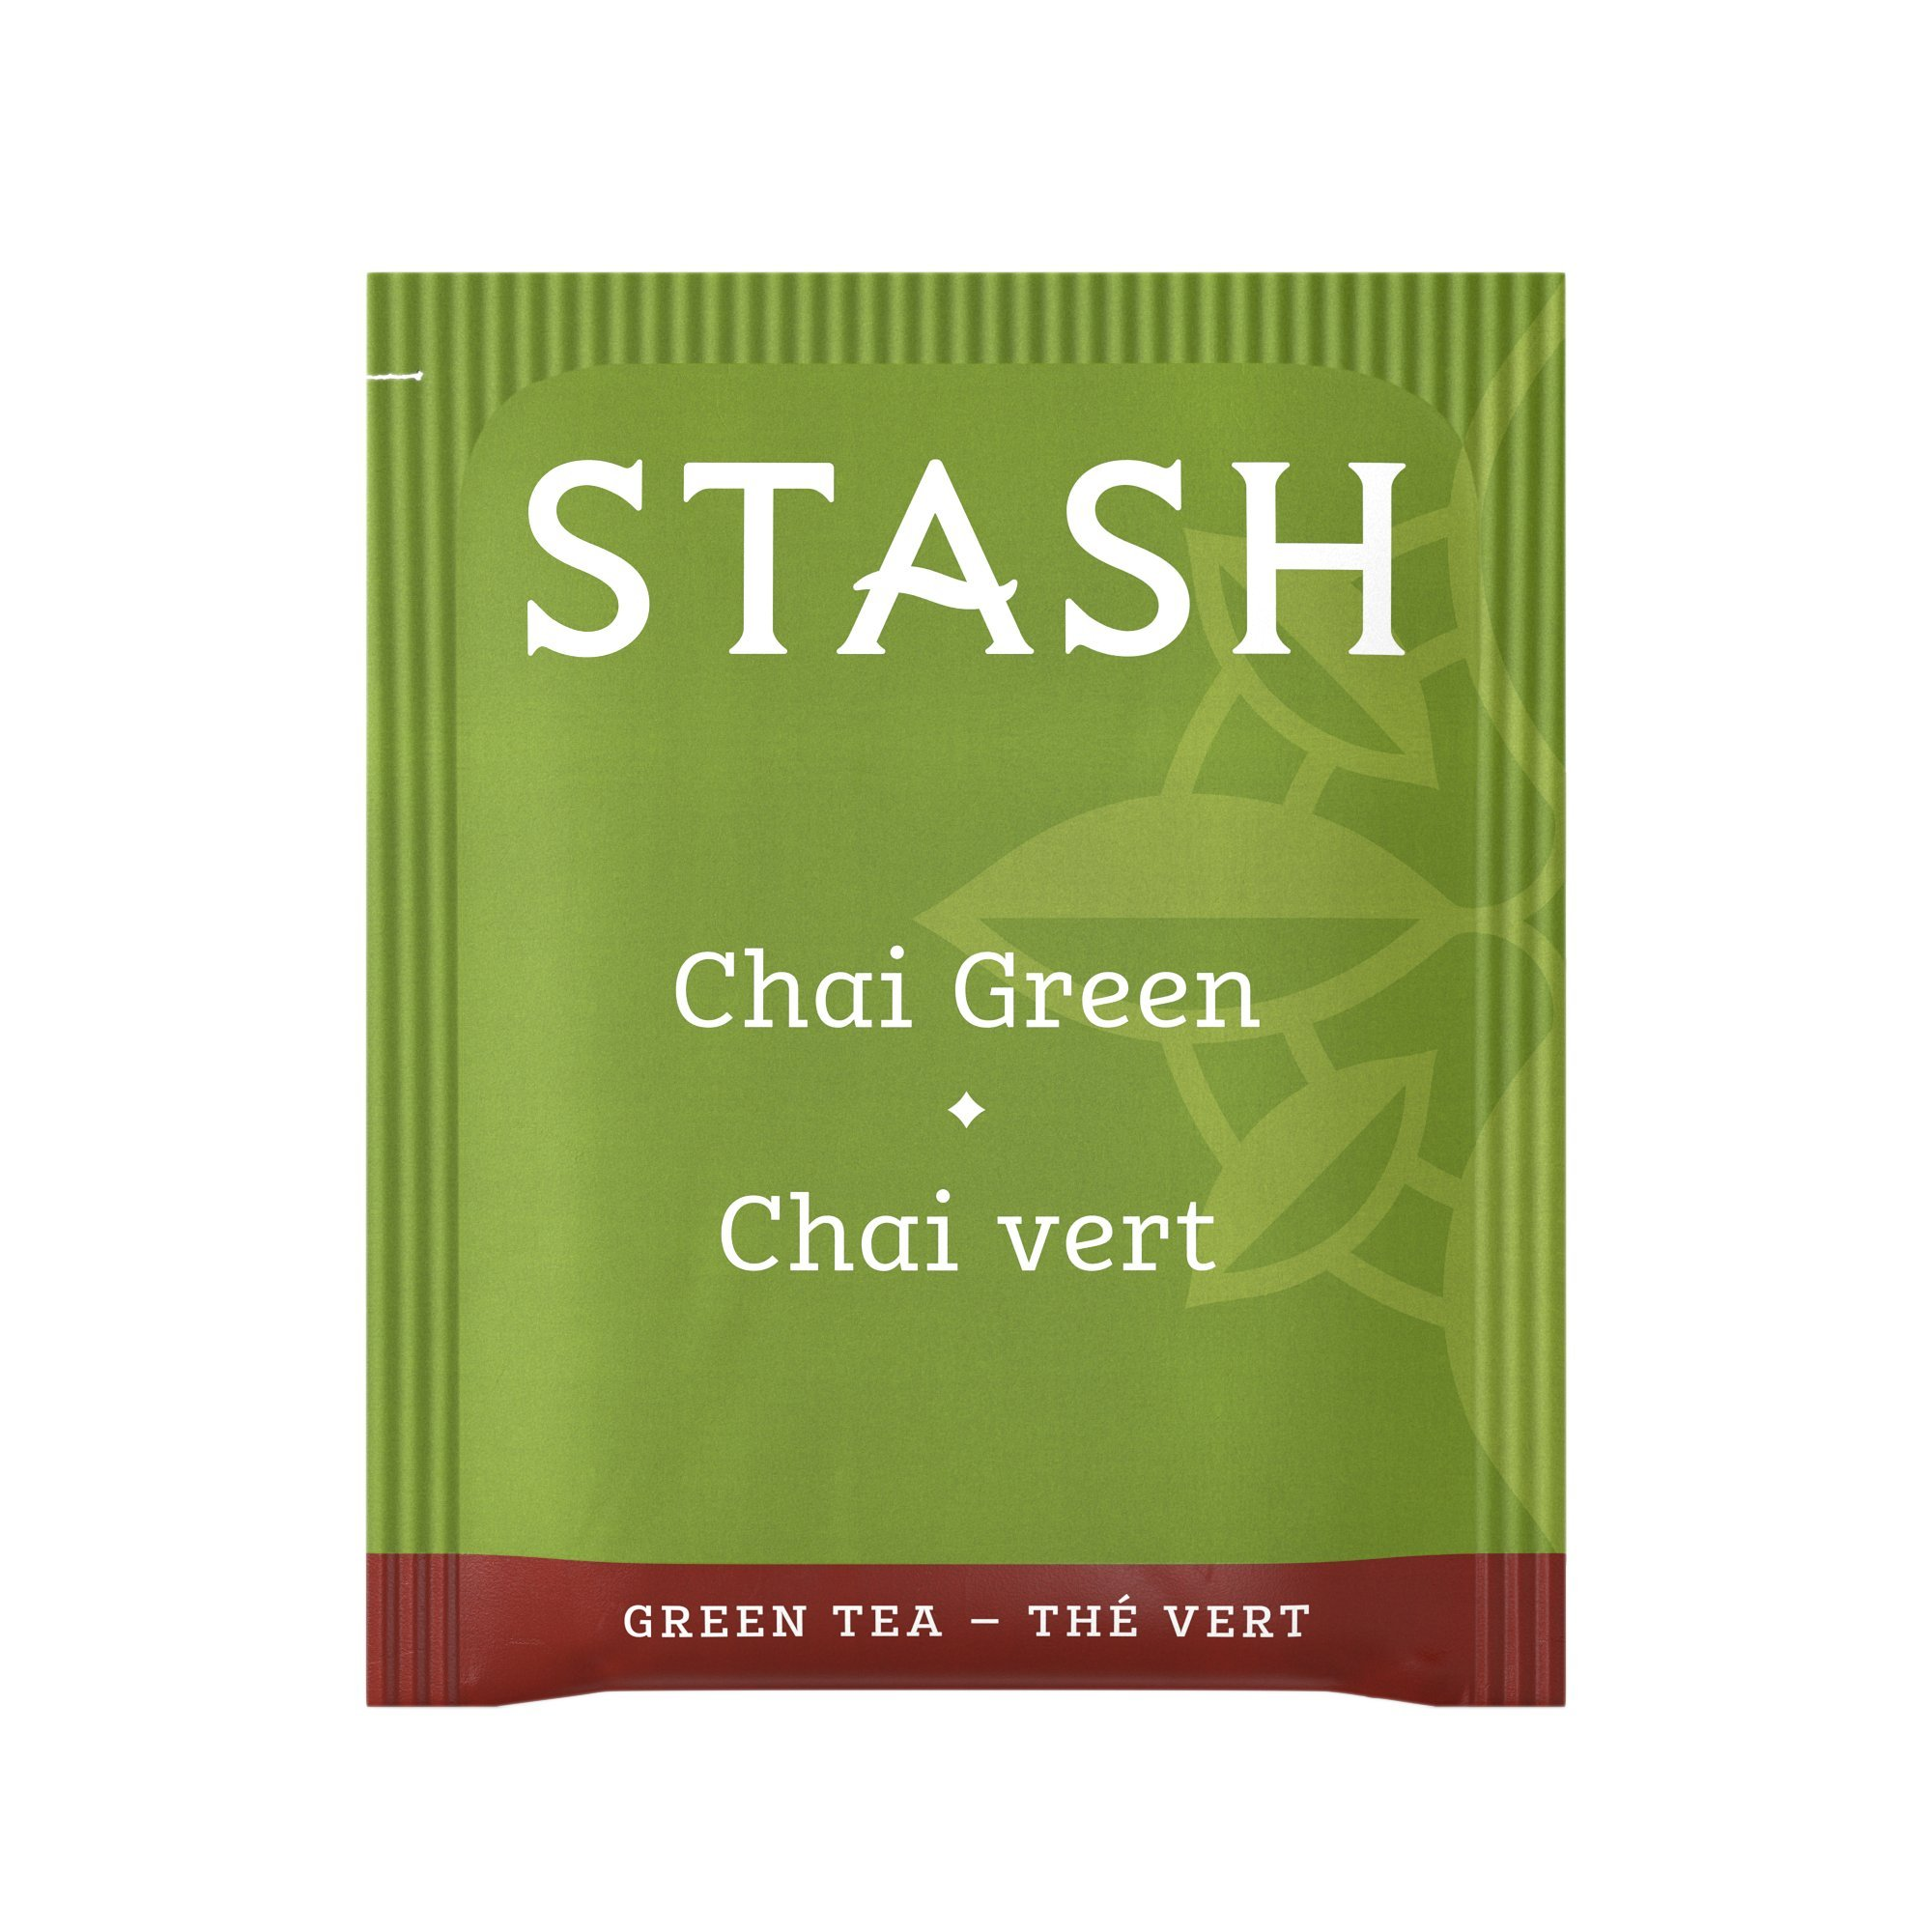 Stash Tea Green Chai Tea 1000 Count Tea Bags in Foil  Individual Spiced Green Tea Bags for Use in Teapots Mugs or Teacups, Brew Hot Tea or Iced Tea, Add Milk for Chai Latte by Stash Tea (Image #3)